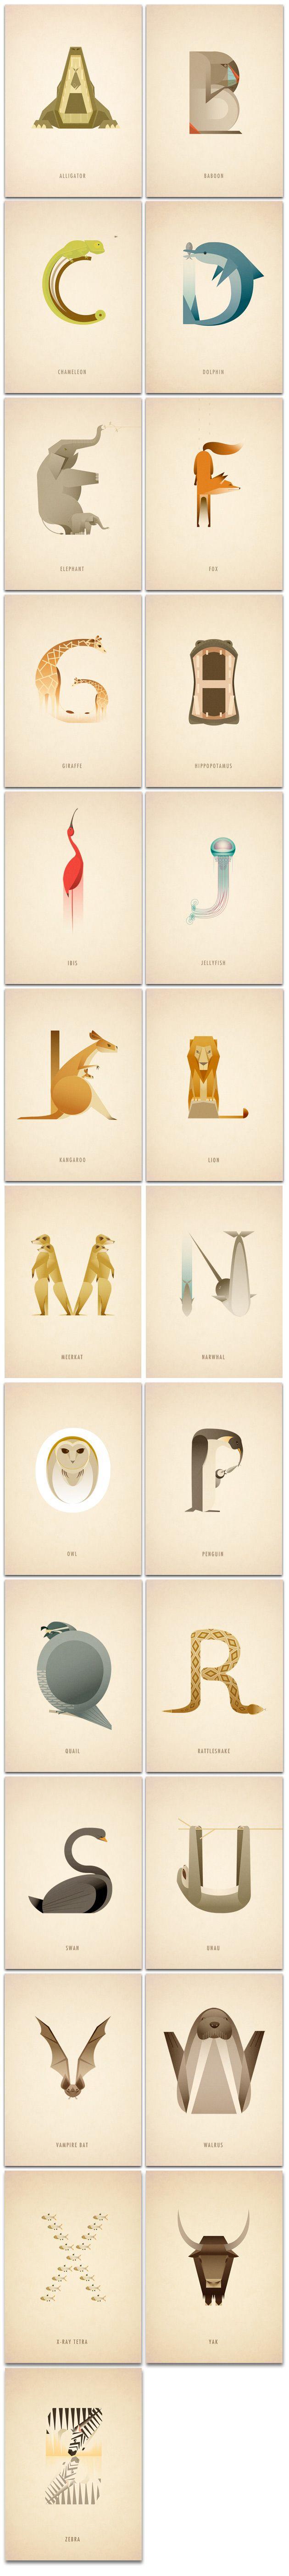 Animal_Alpabet01 #tipography #animal                                                                                                                                                                                 Más